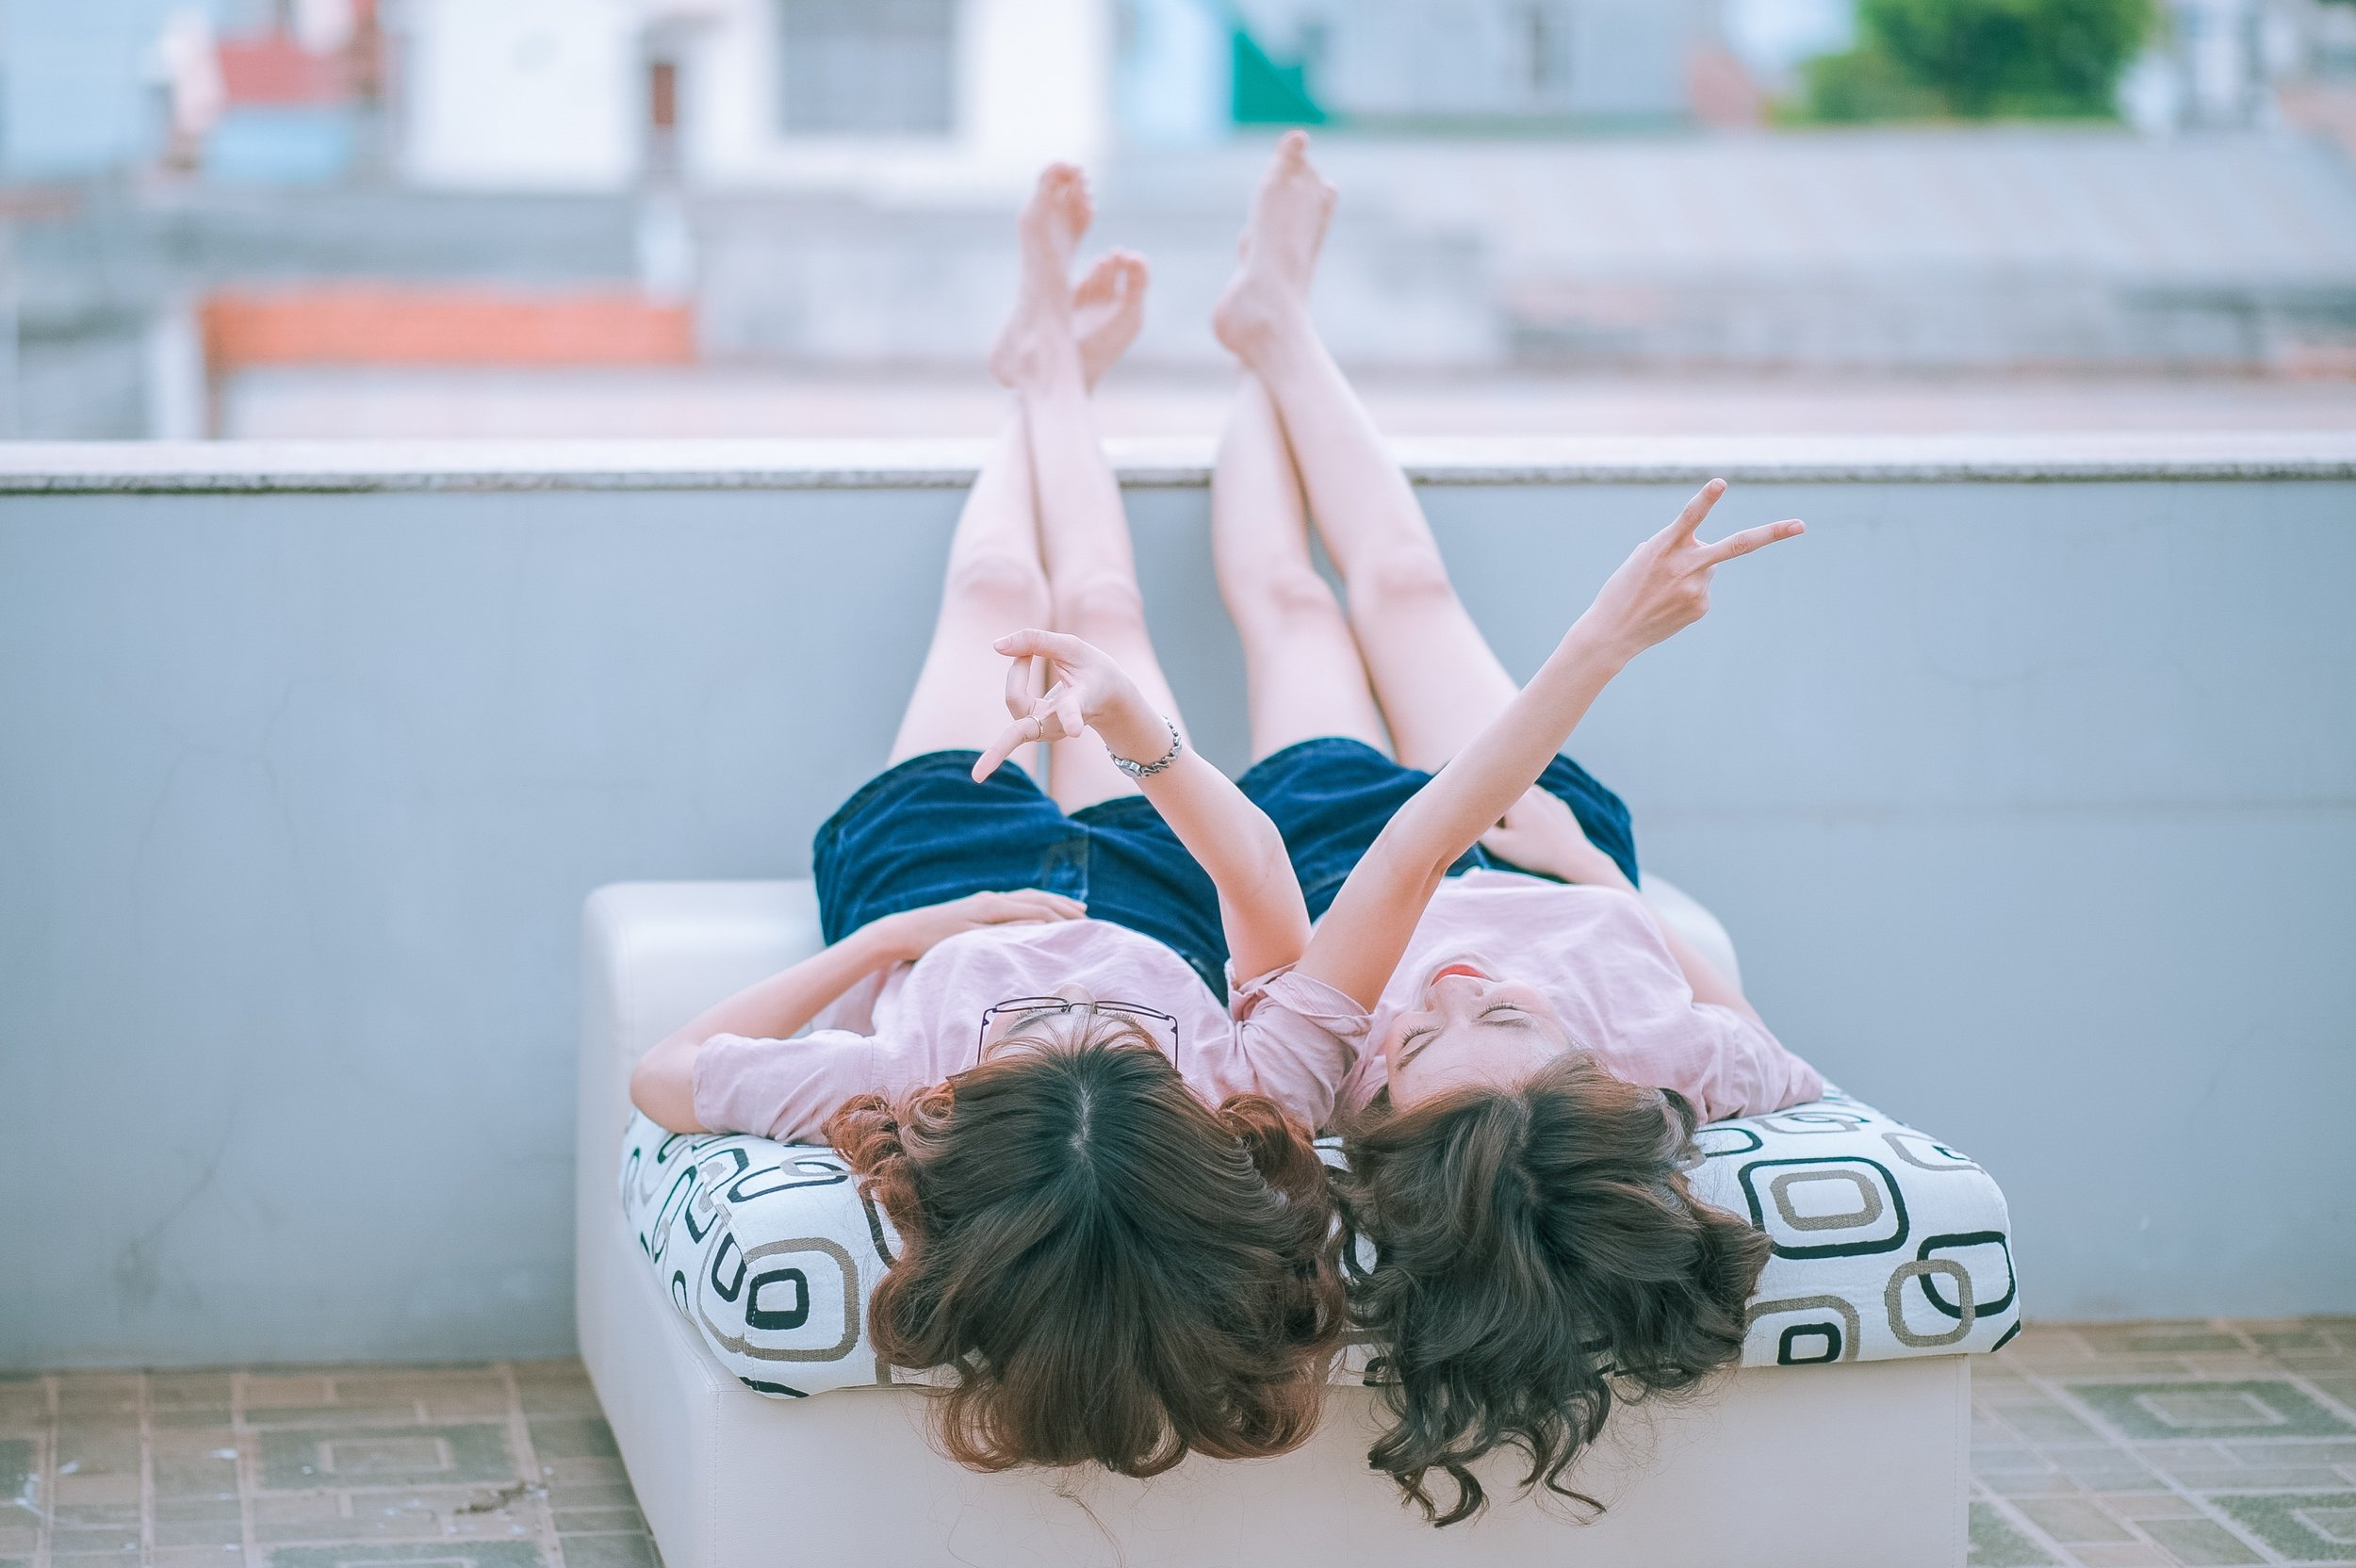 Never Unfriended: The Secret to Finding & Keeping Lasting Friendships by Lisa-Jo Baker